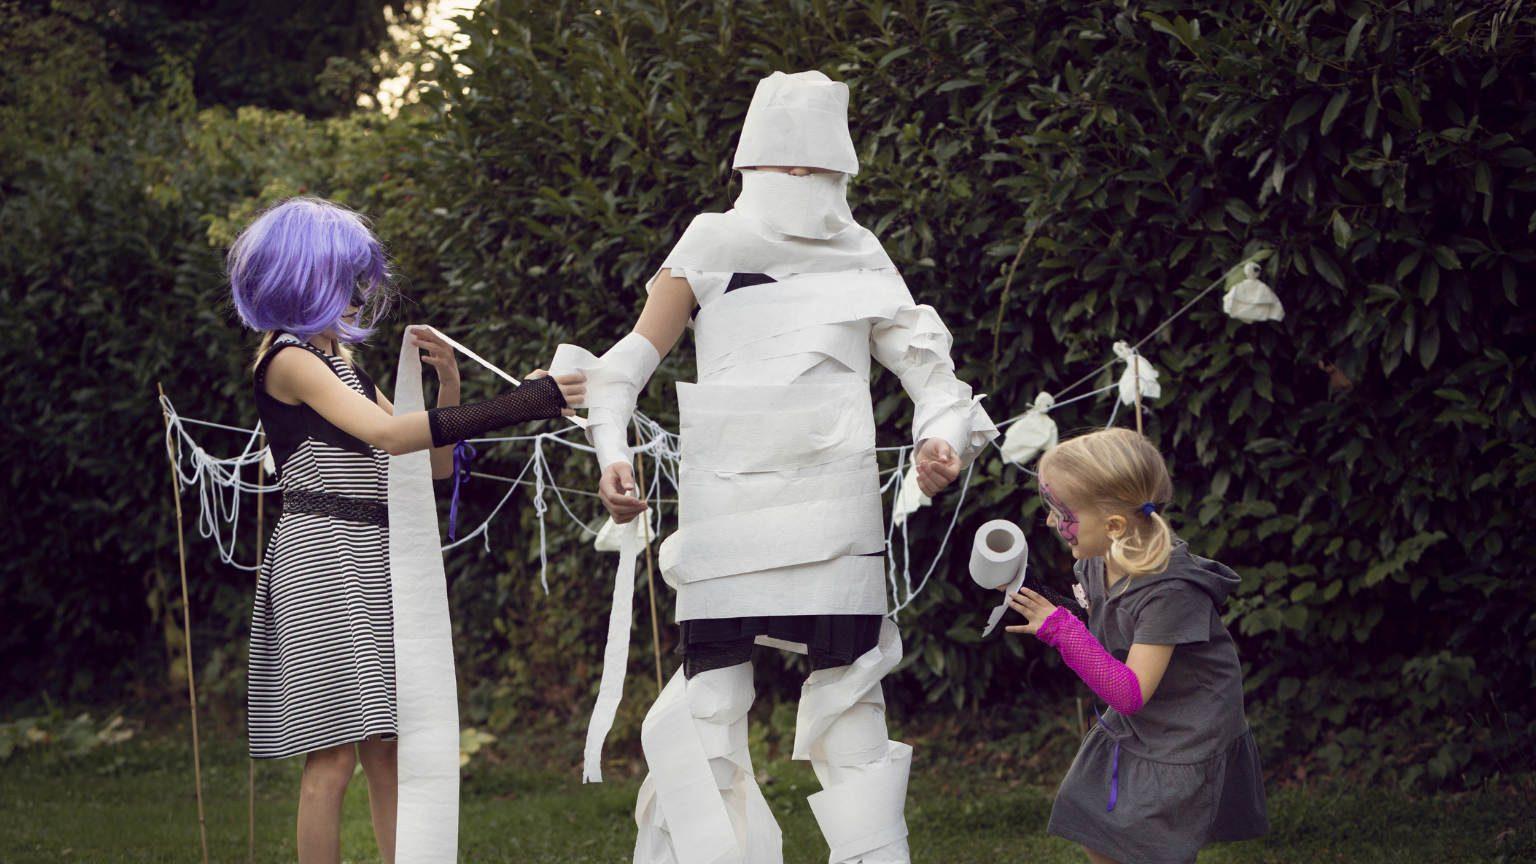 Kids in cute Halloween costume